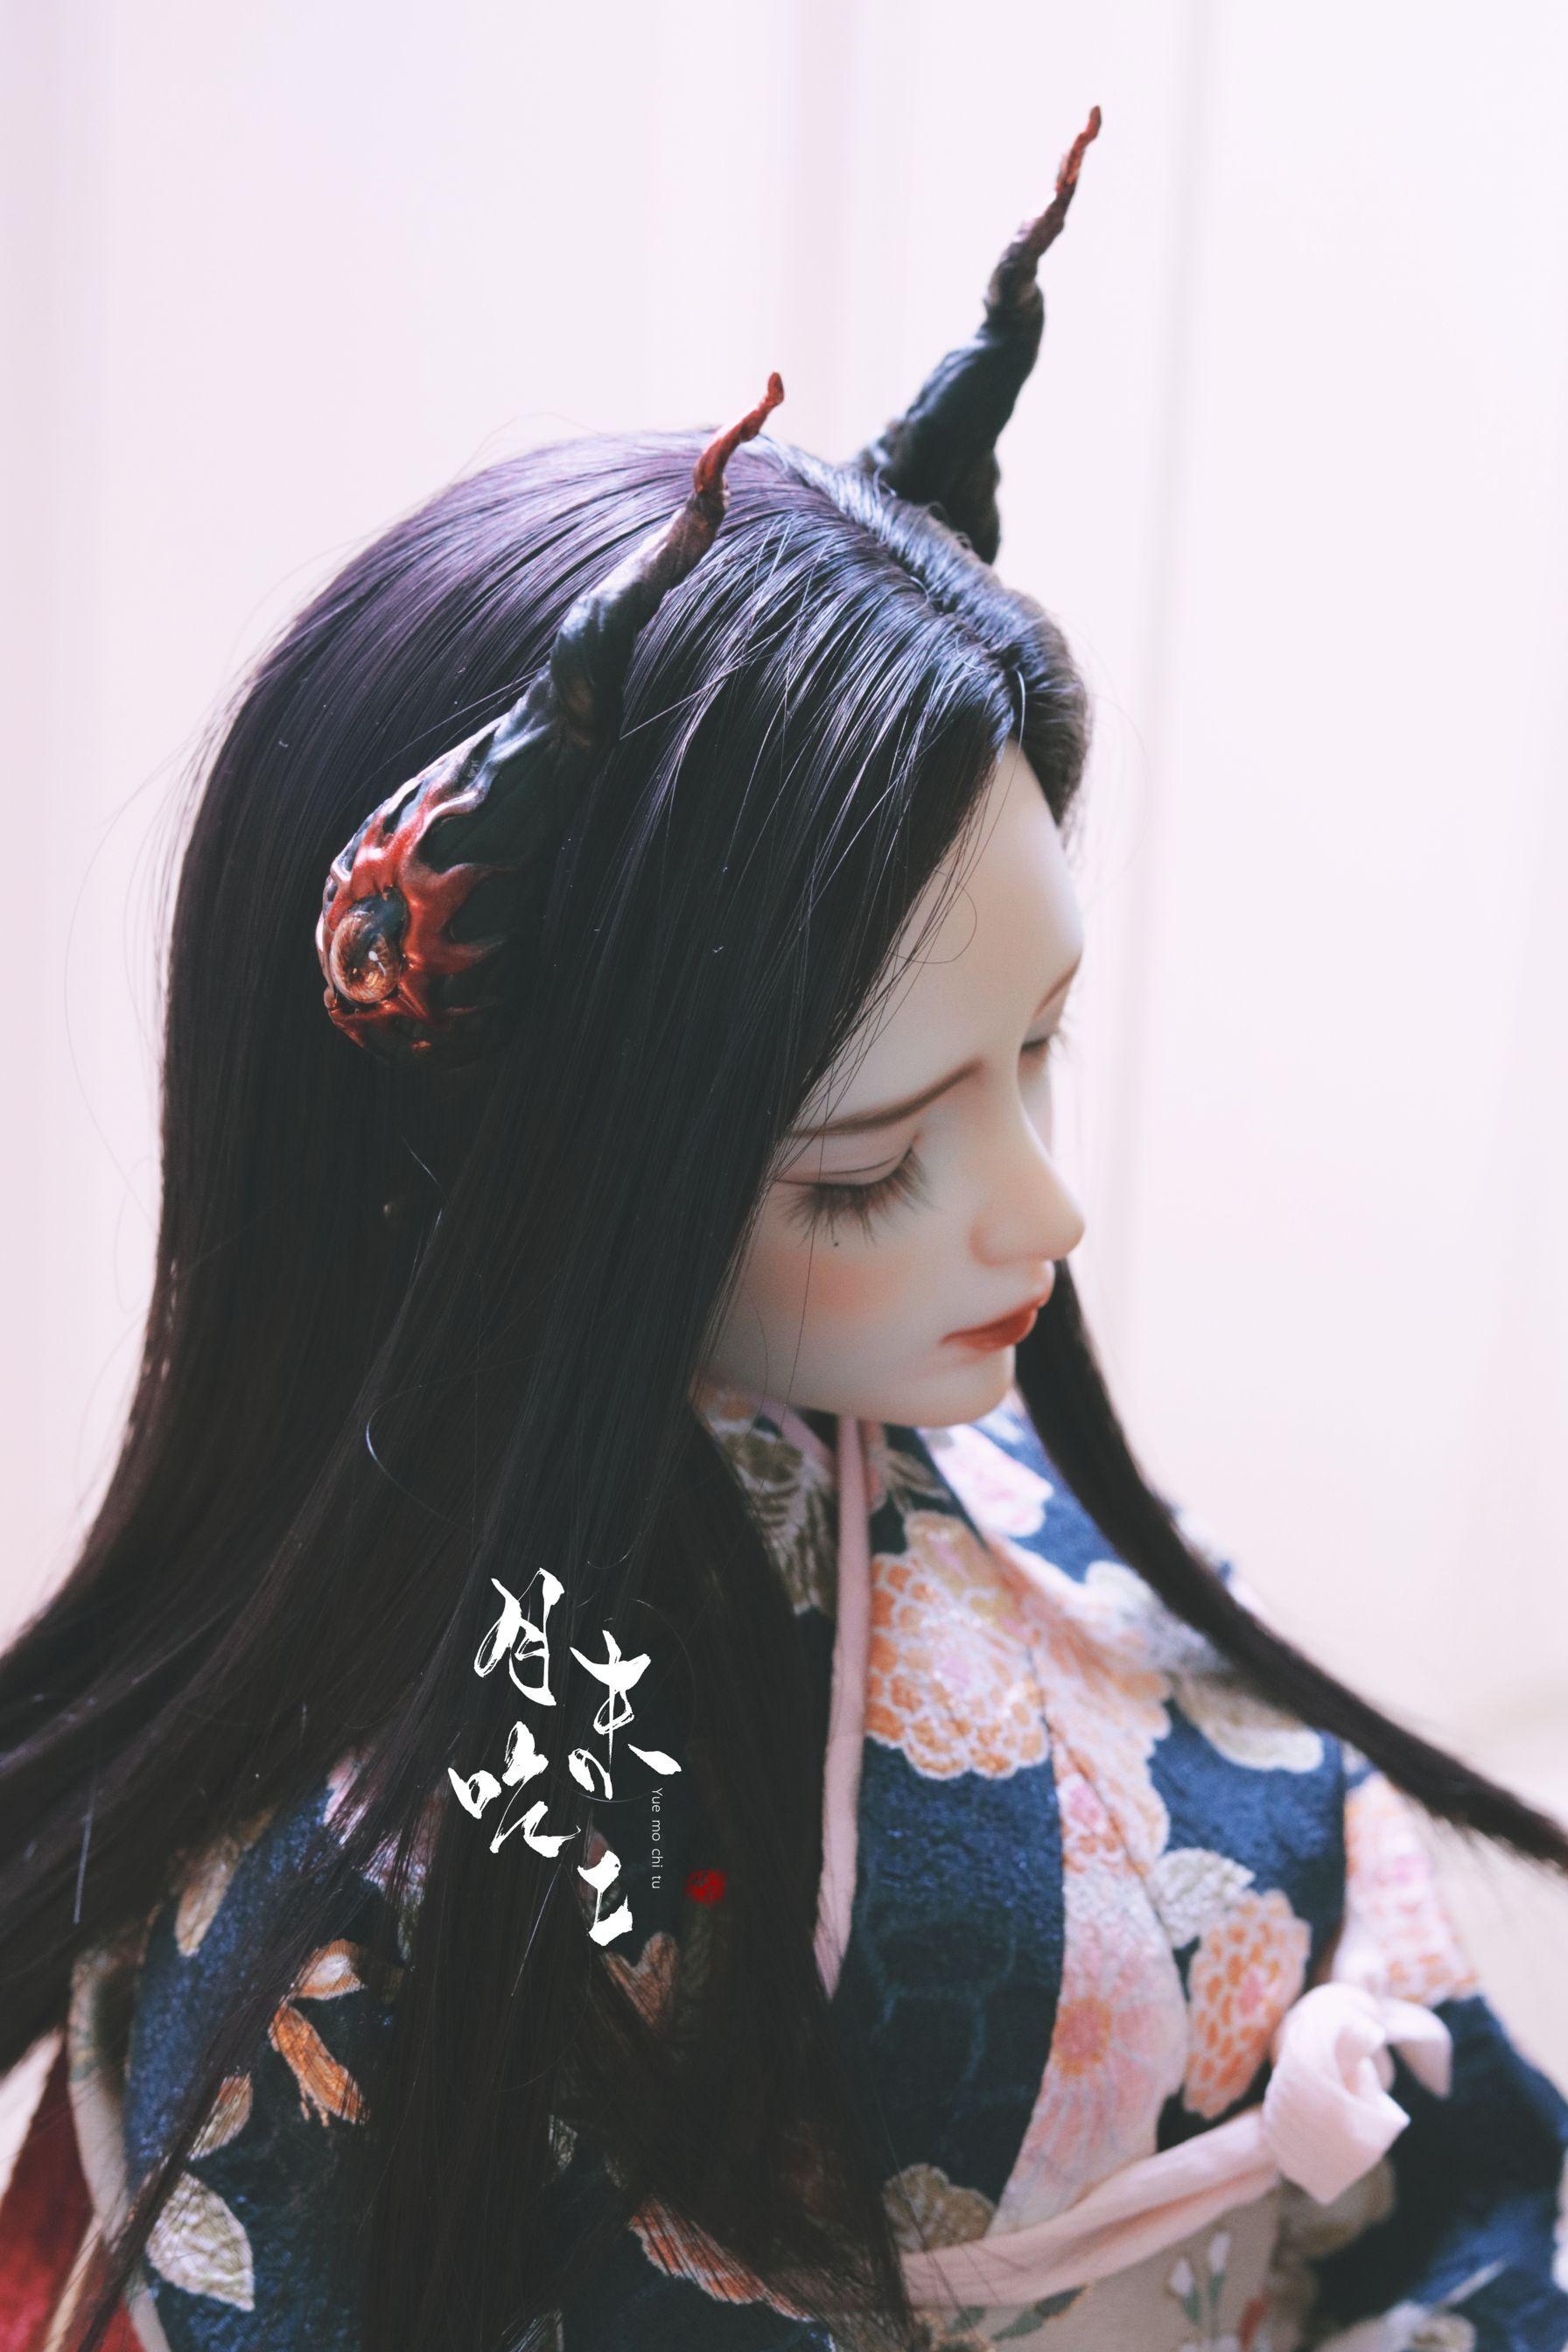 2020 Linlang Jinyuan + dark engraving cooperation BJD baby props devils corner mastema spot & pre-sale